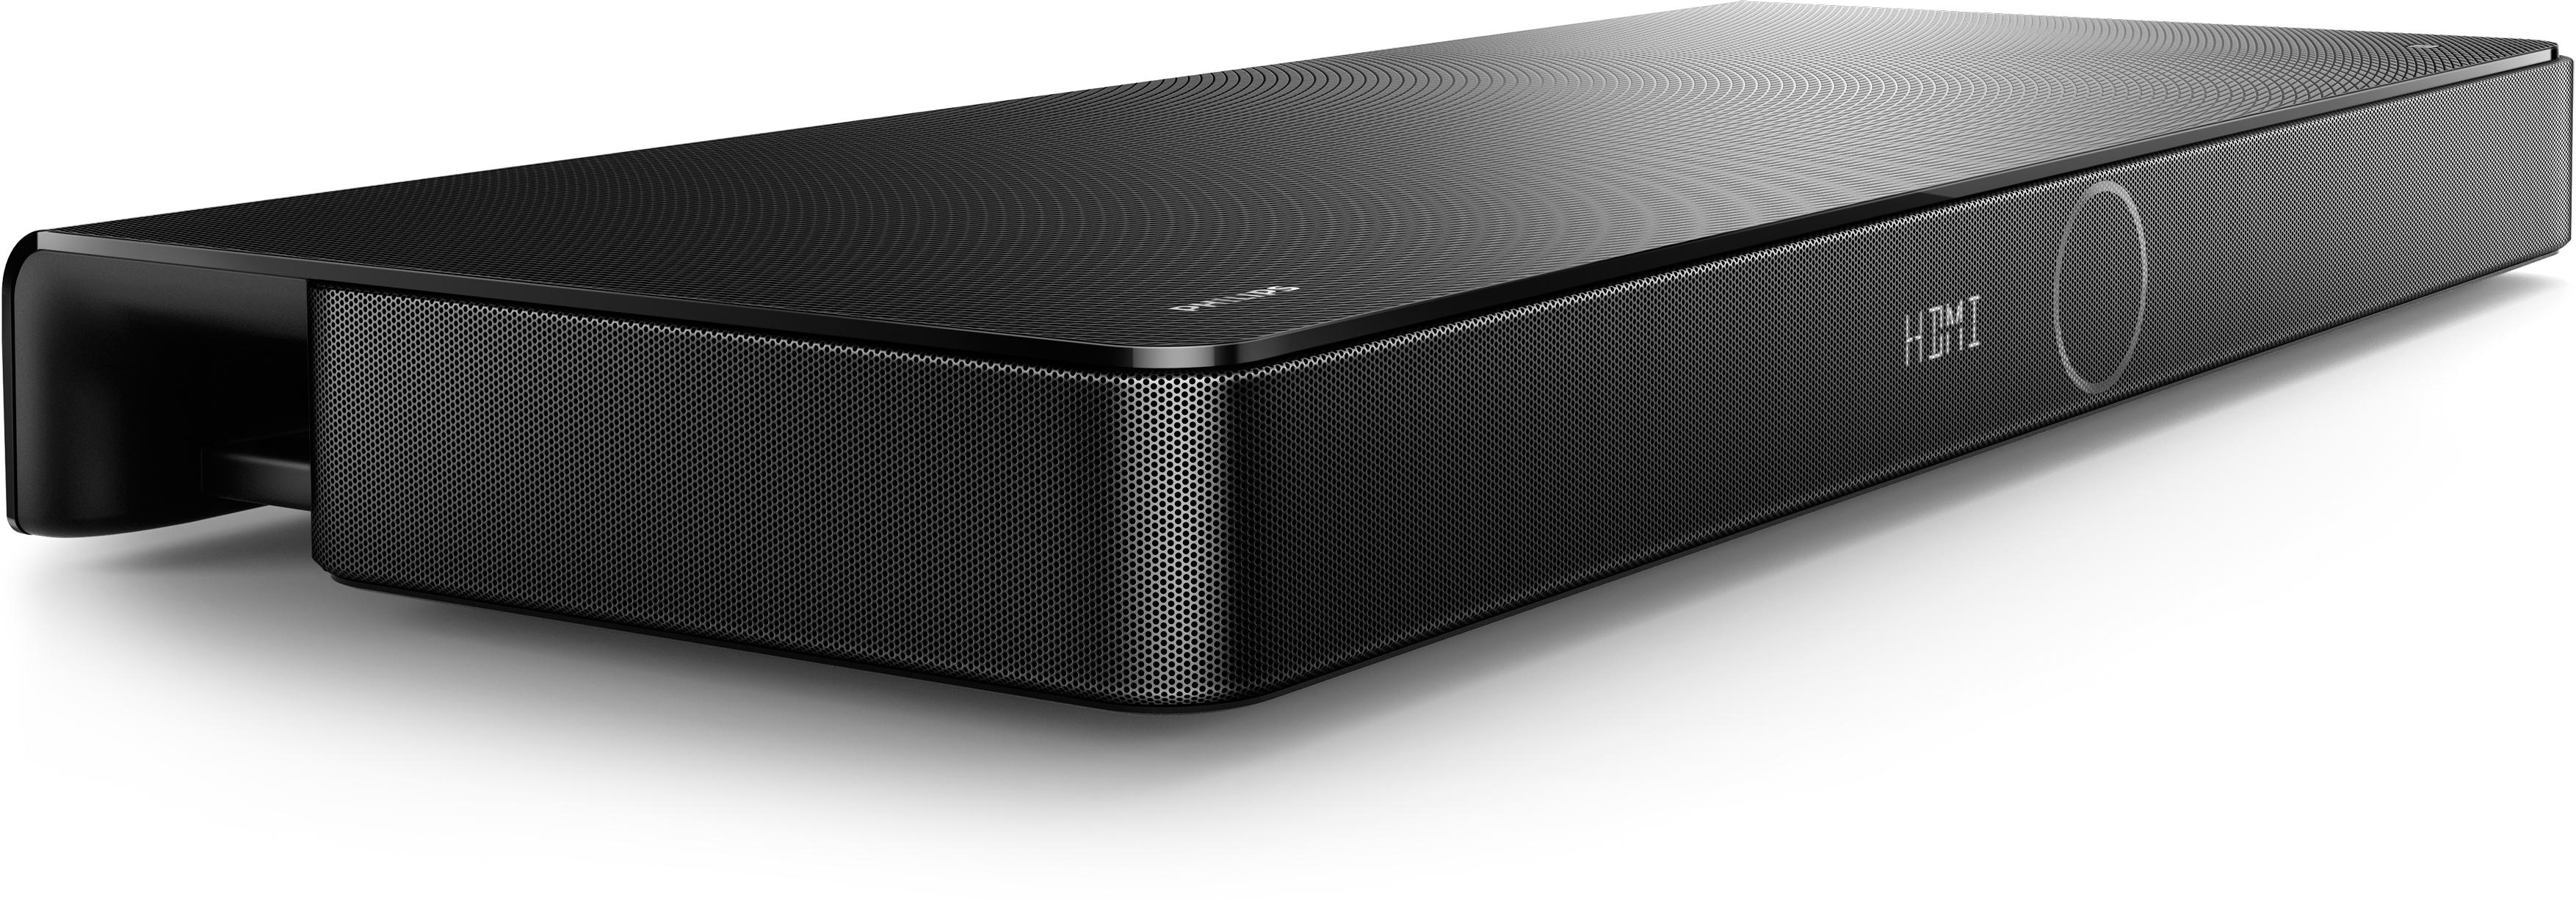 Philips_SoundStage_speaker_HTL5130B_image2)KI